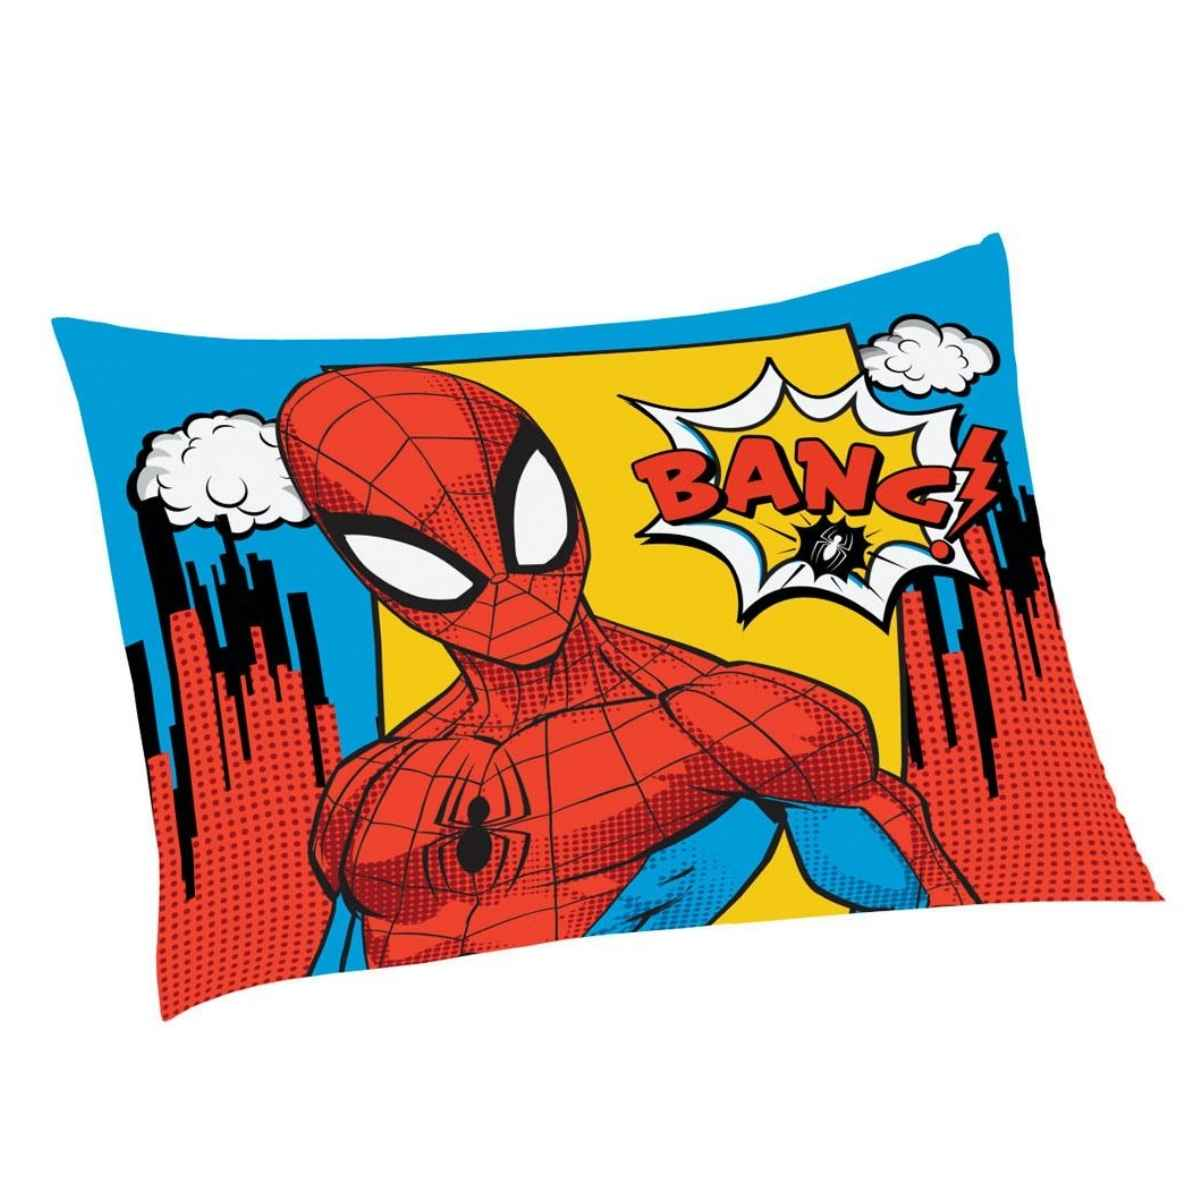 Fronha infantil licenciada 50x70 Spider-Man